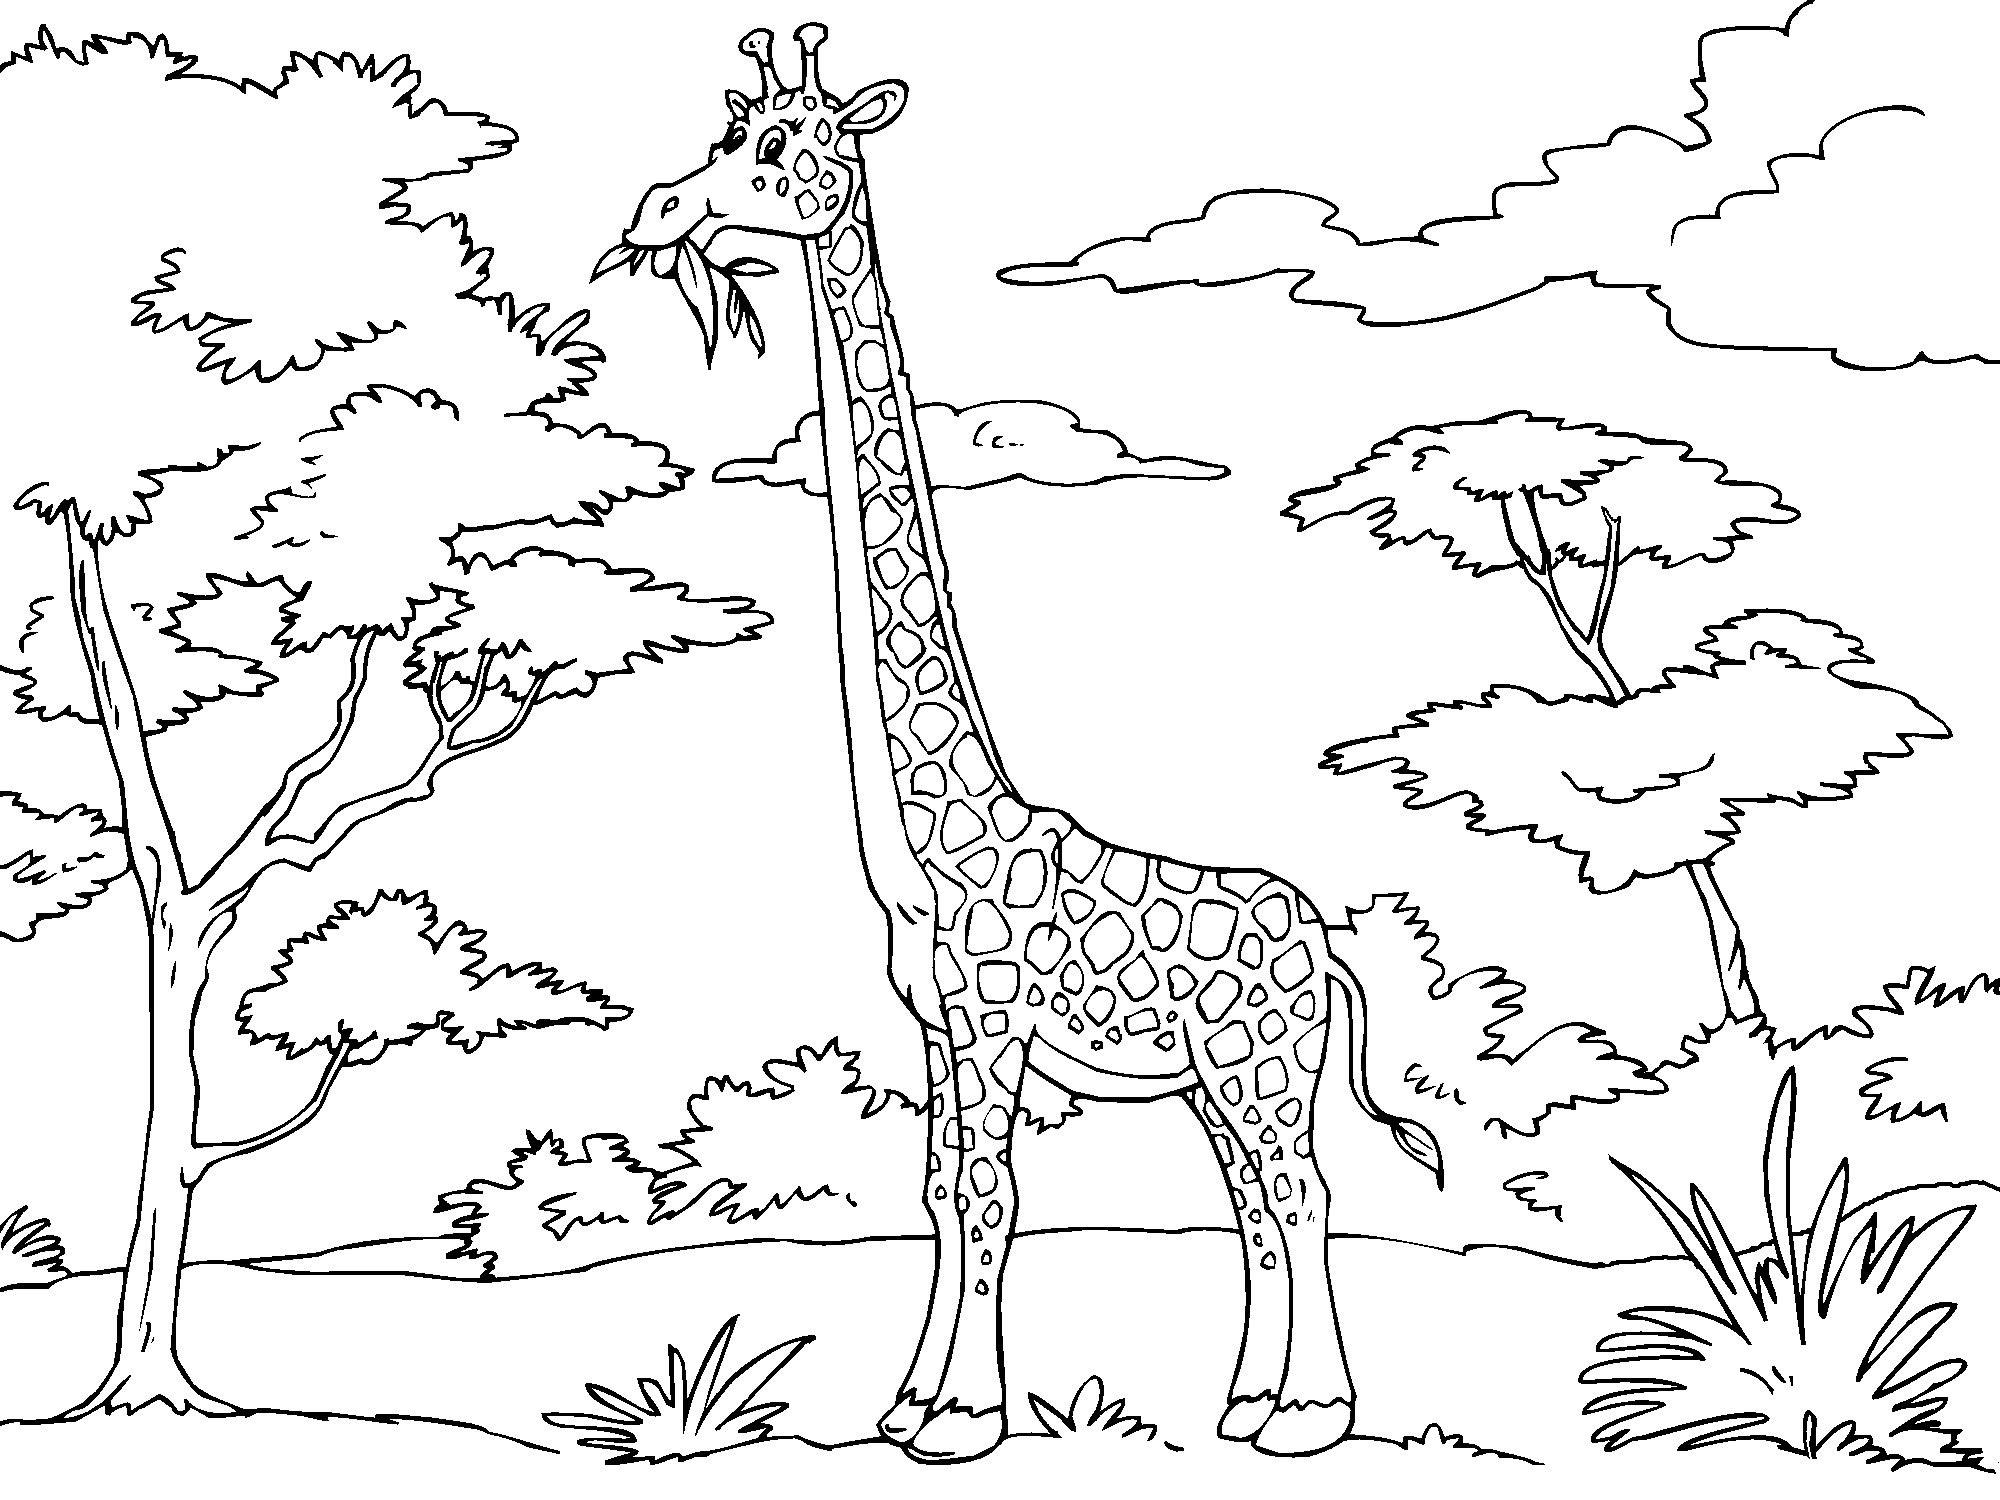 Dibujos Para Colorear De Paisajes Con Animales Imagenes De Paisajes